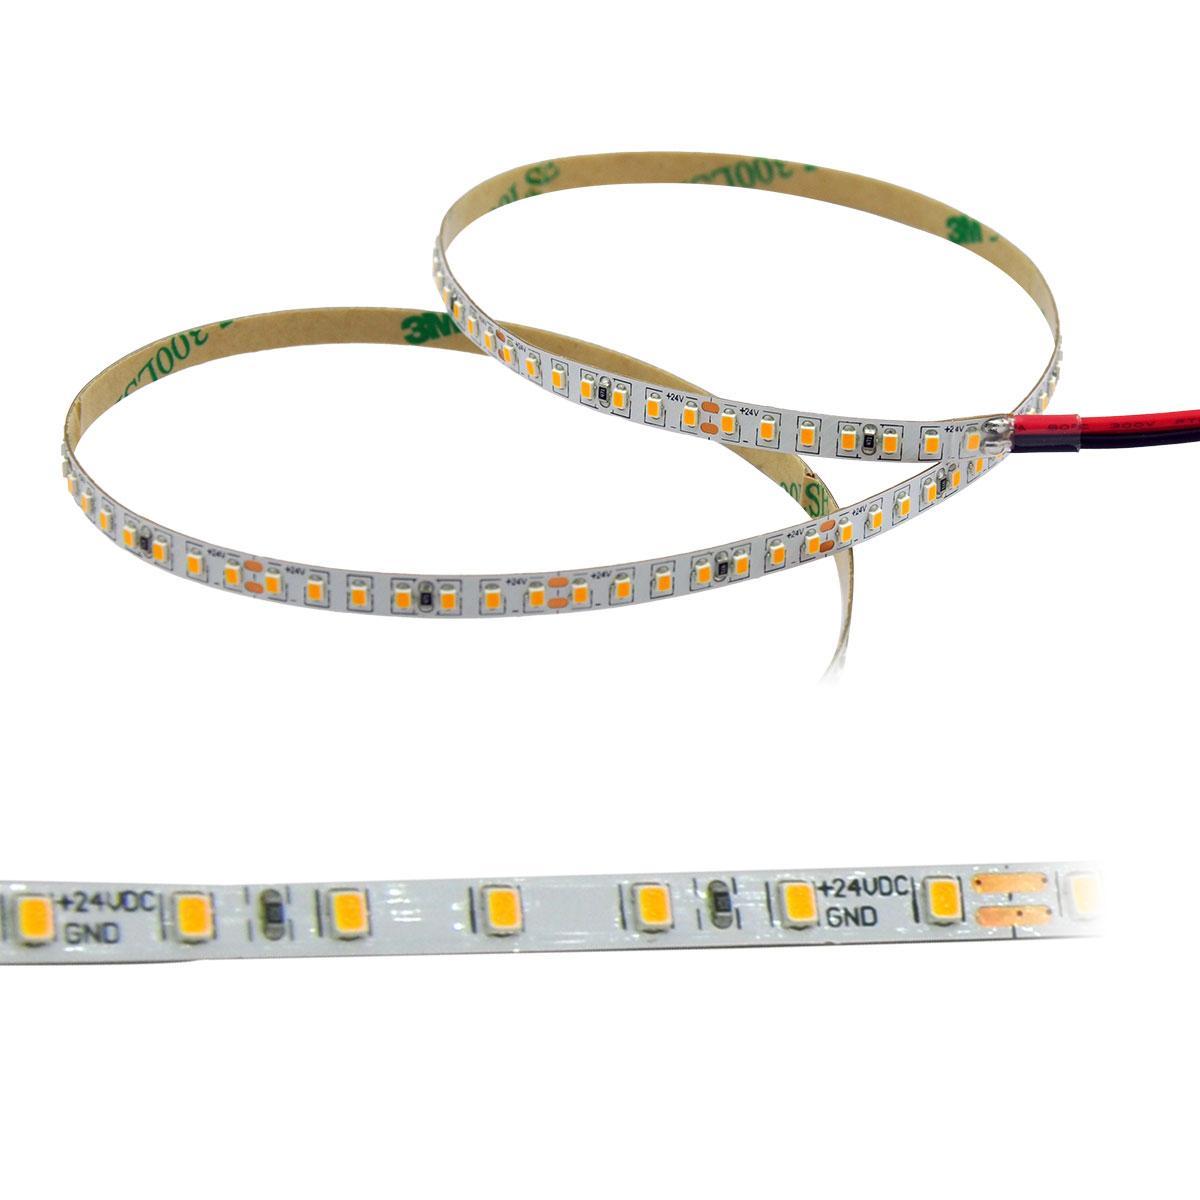 Strip Warmweiß 24V CRI90 LED Streifen 5M 4W/m 140LED/m 3,5mm IP20 3000K